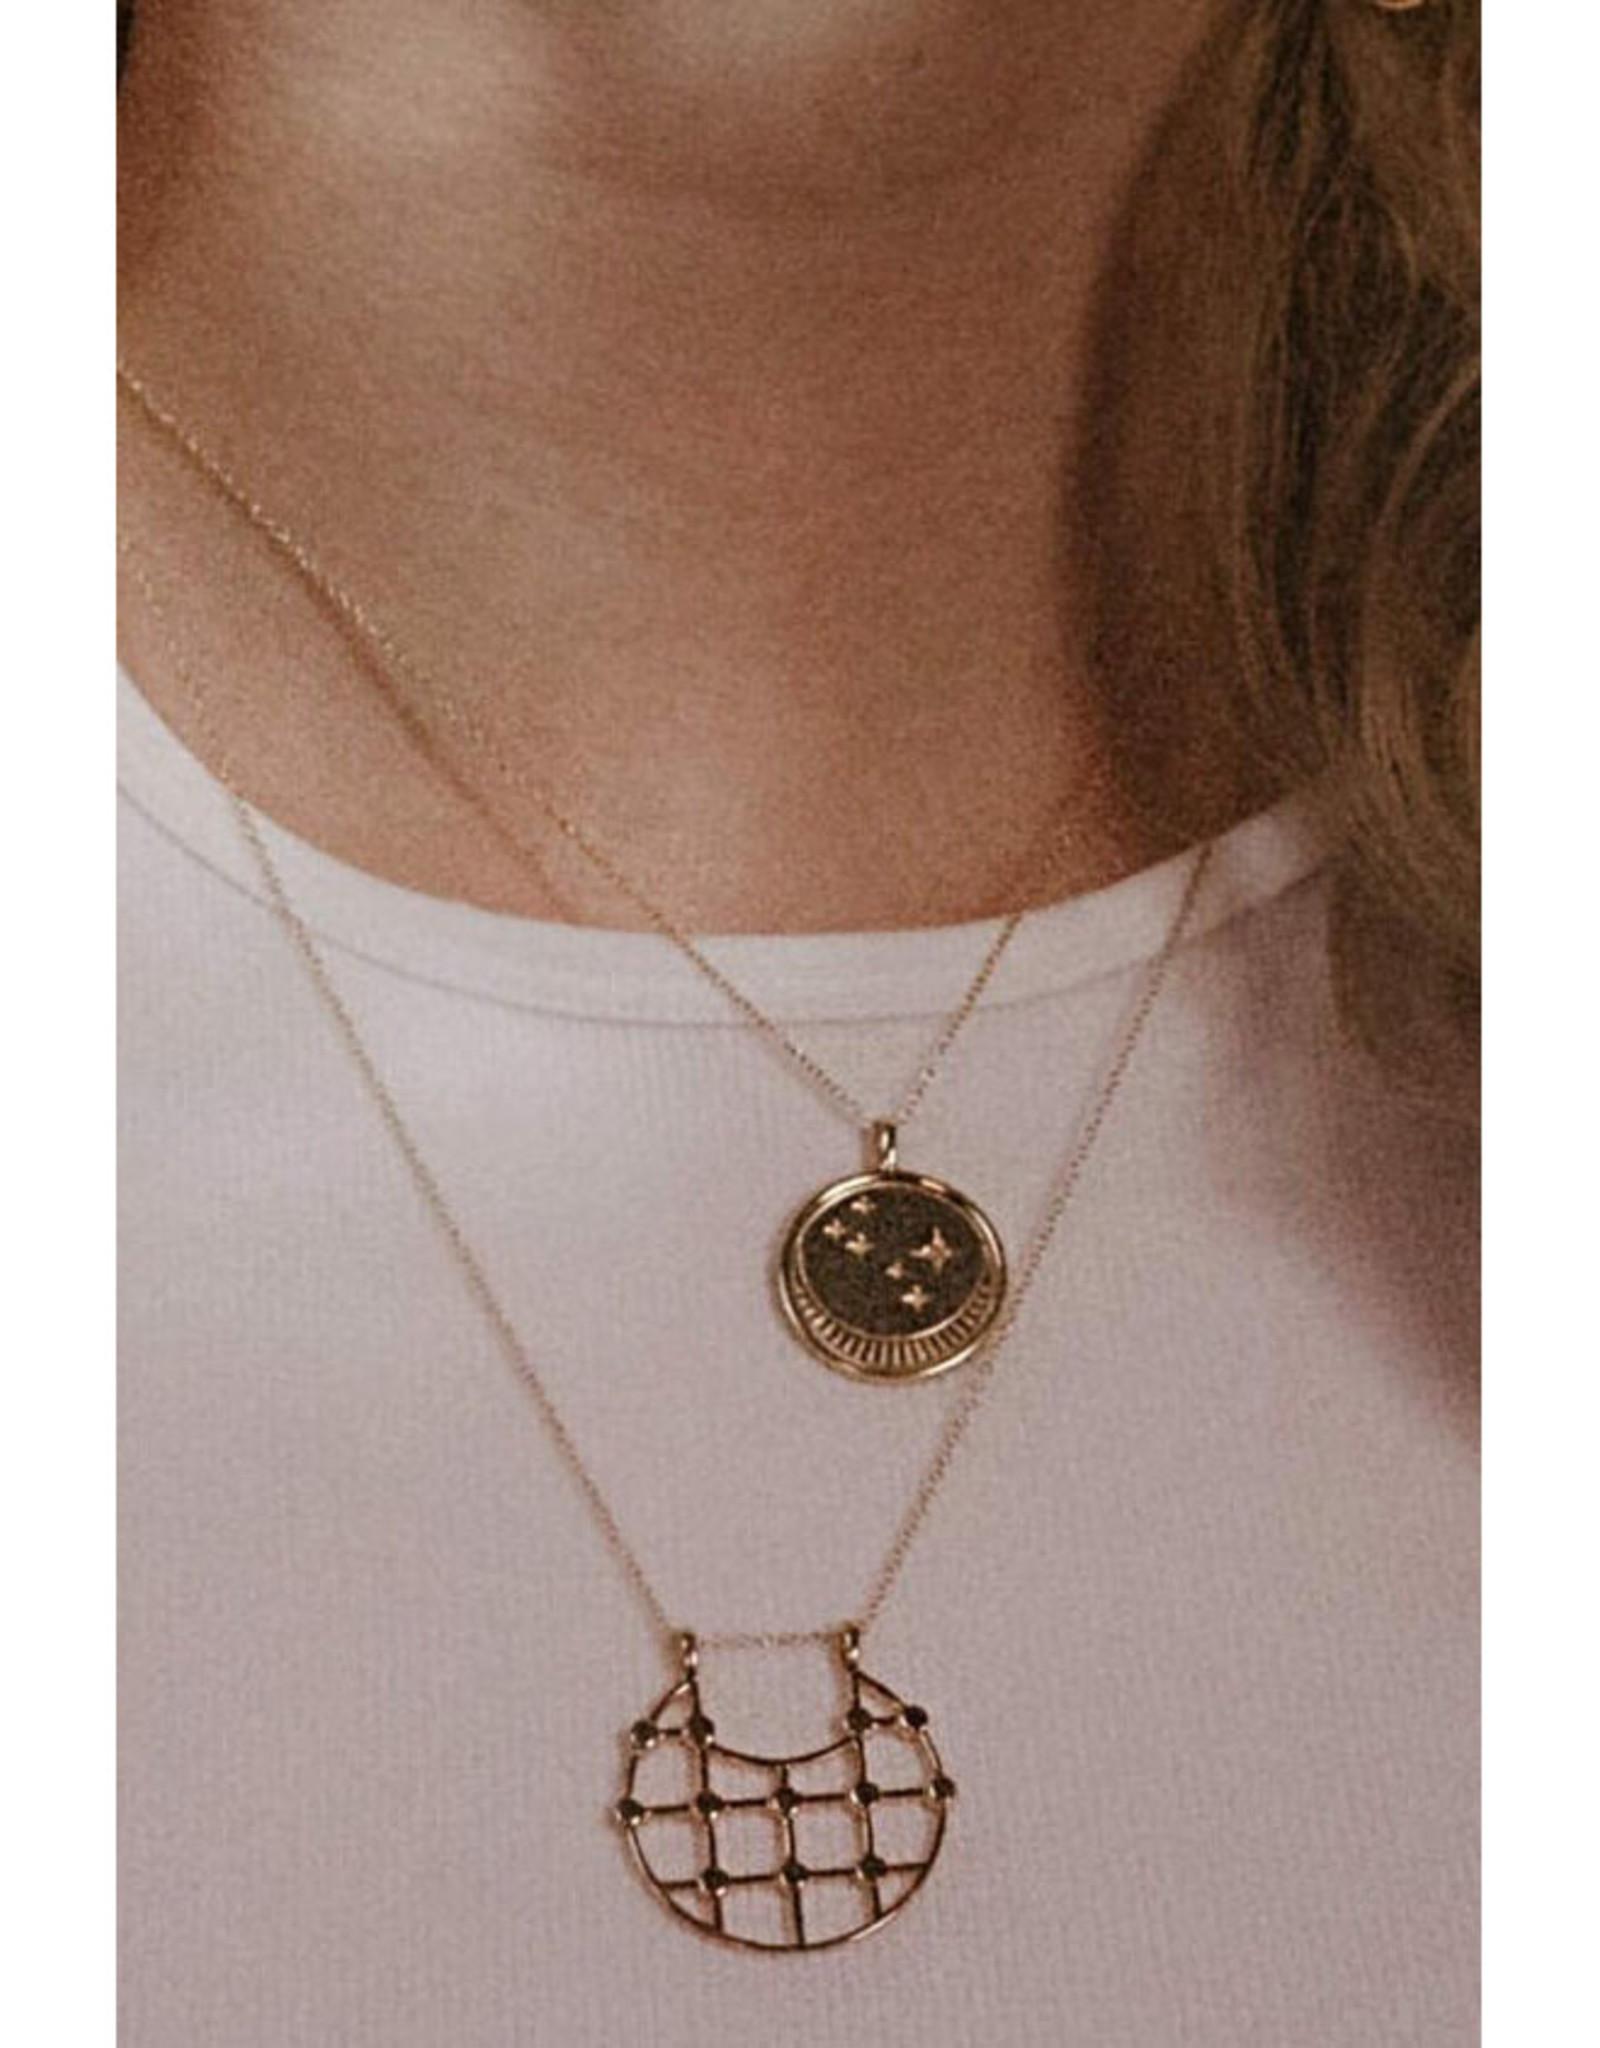 Sarah Mulder Jewelry Arya Necklace - Gold